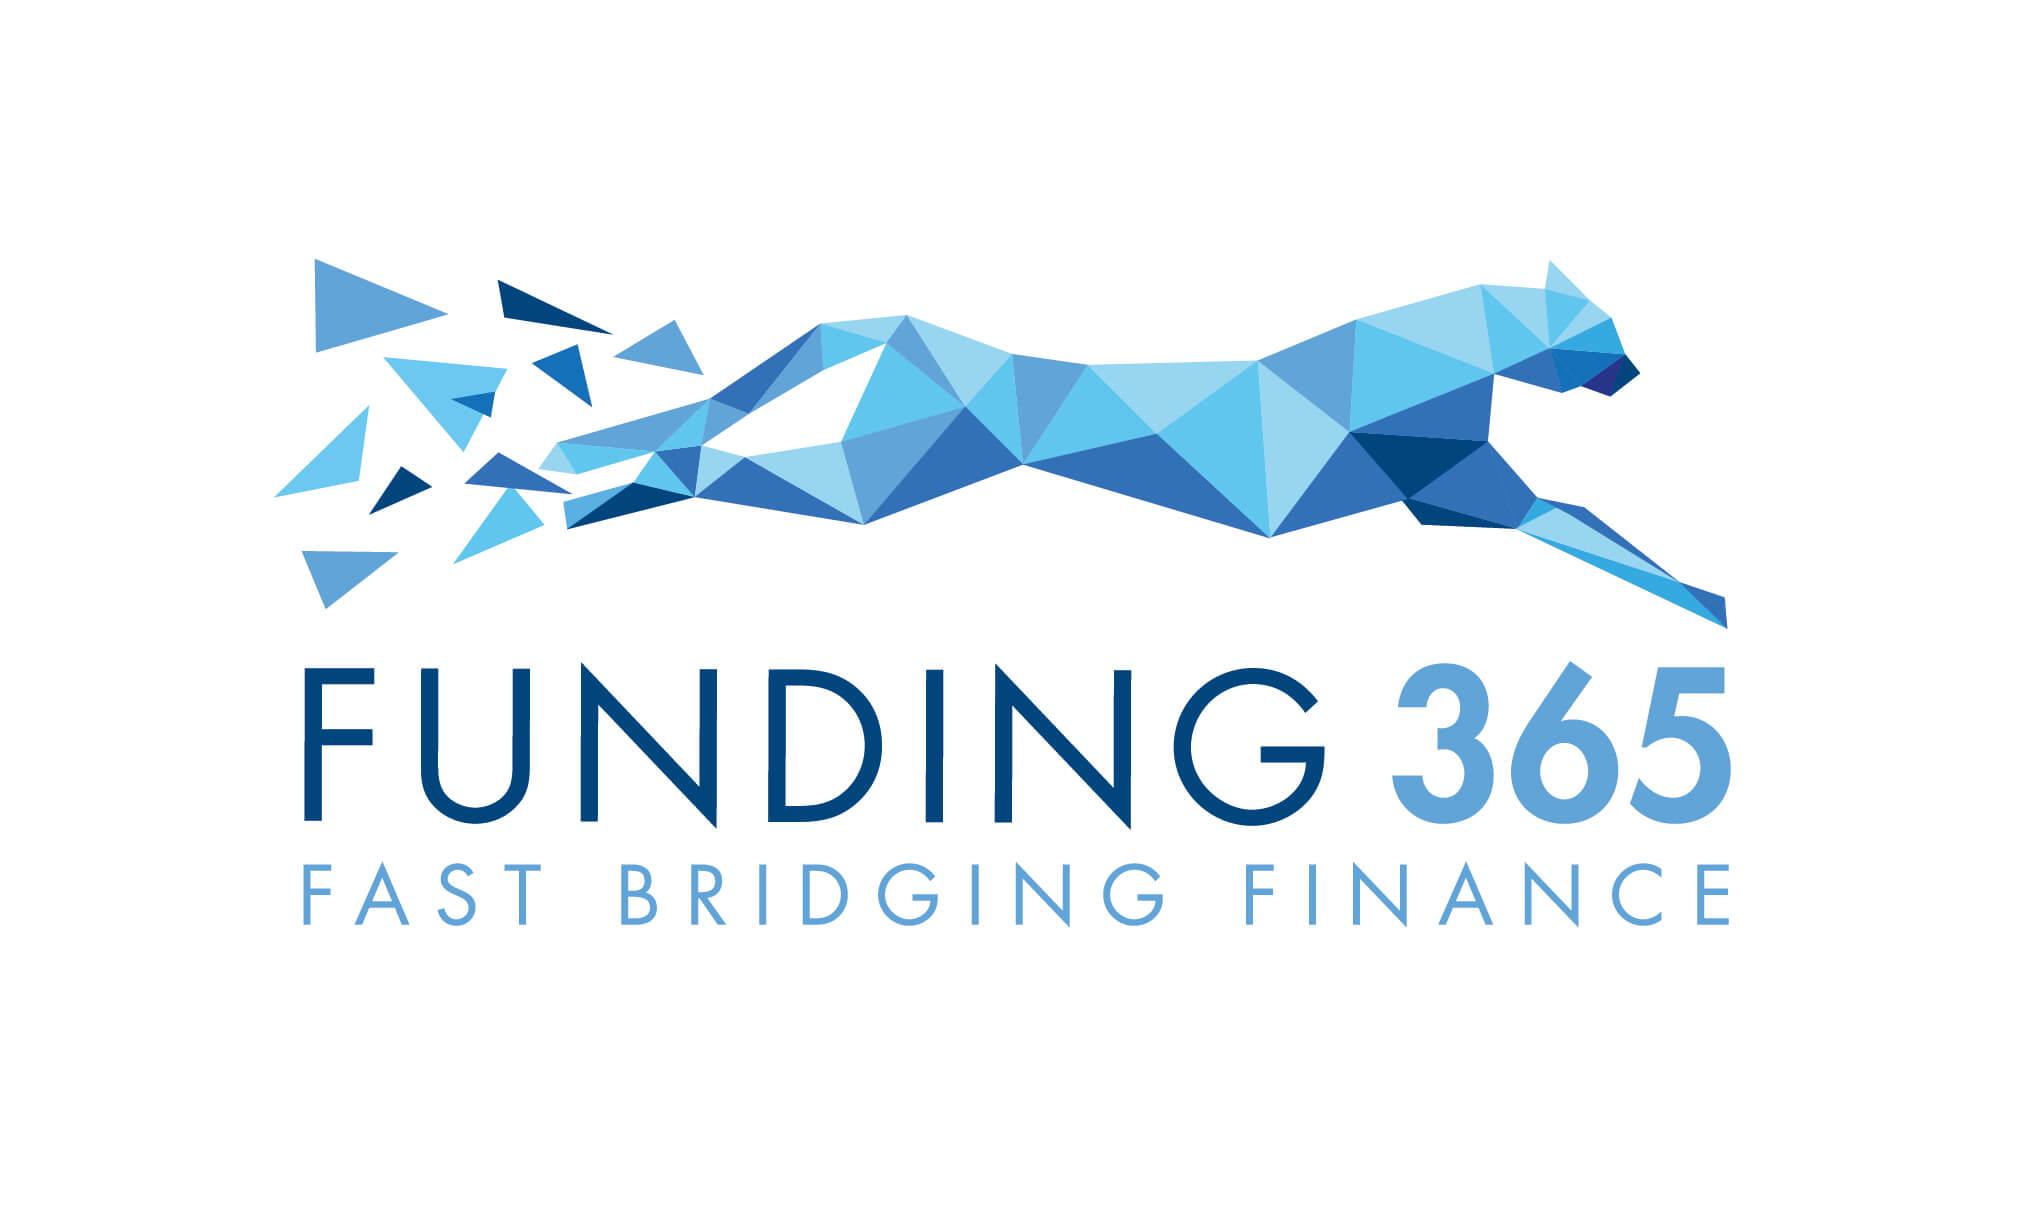 funding-365